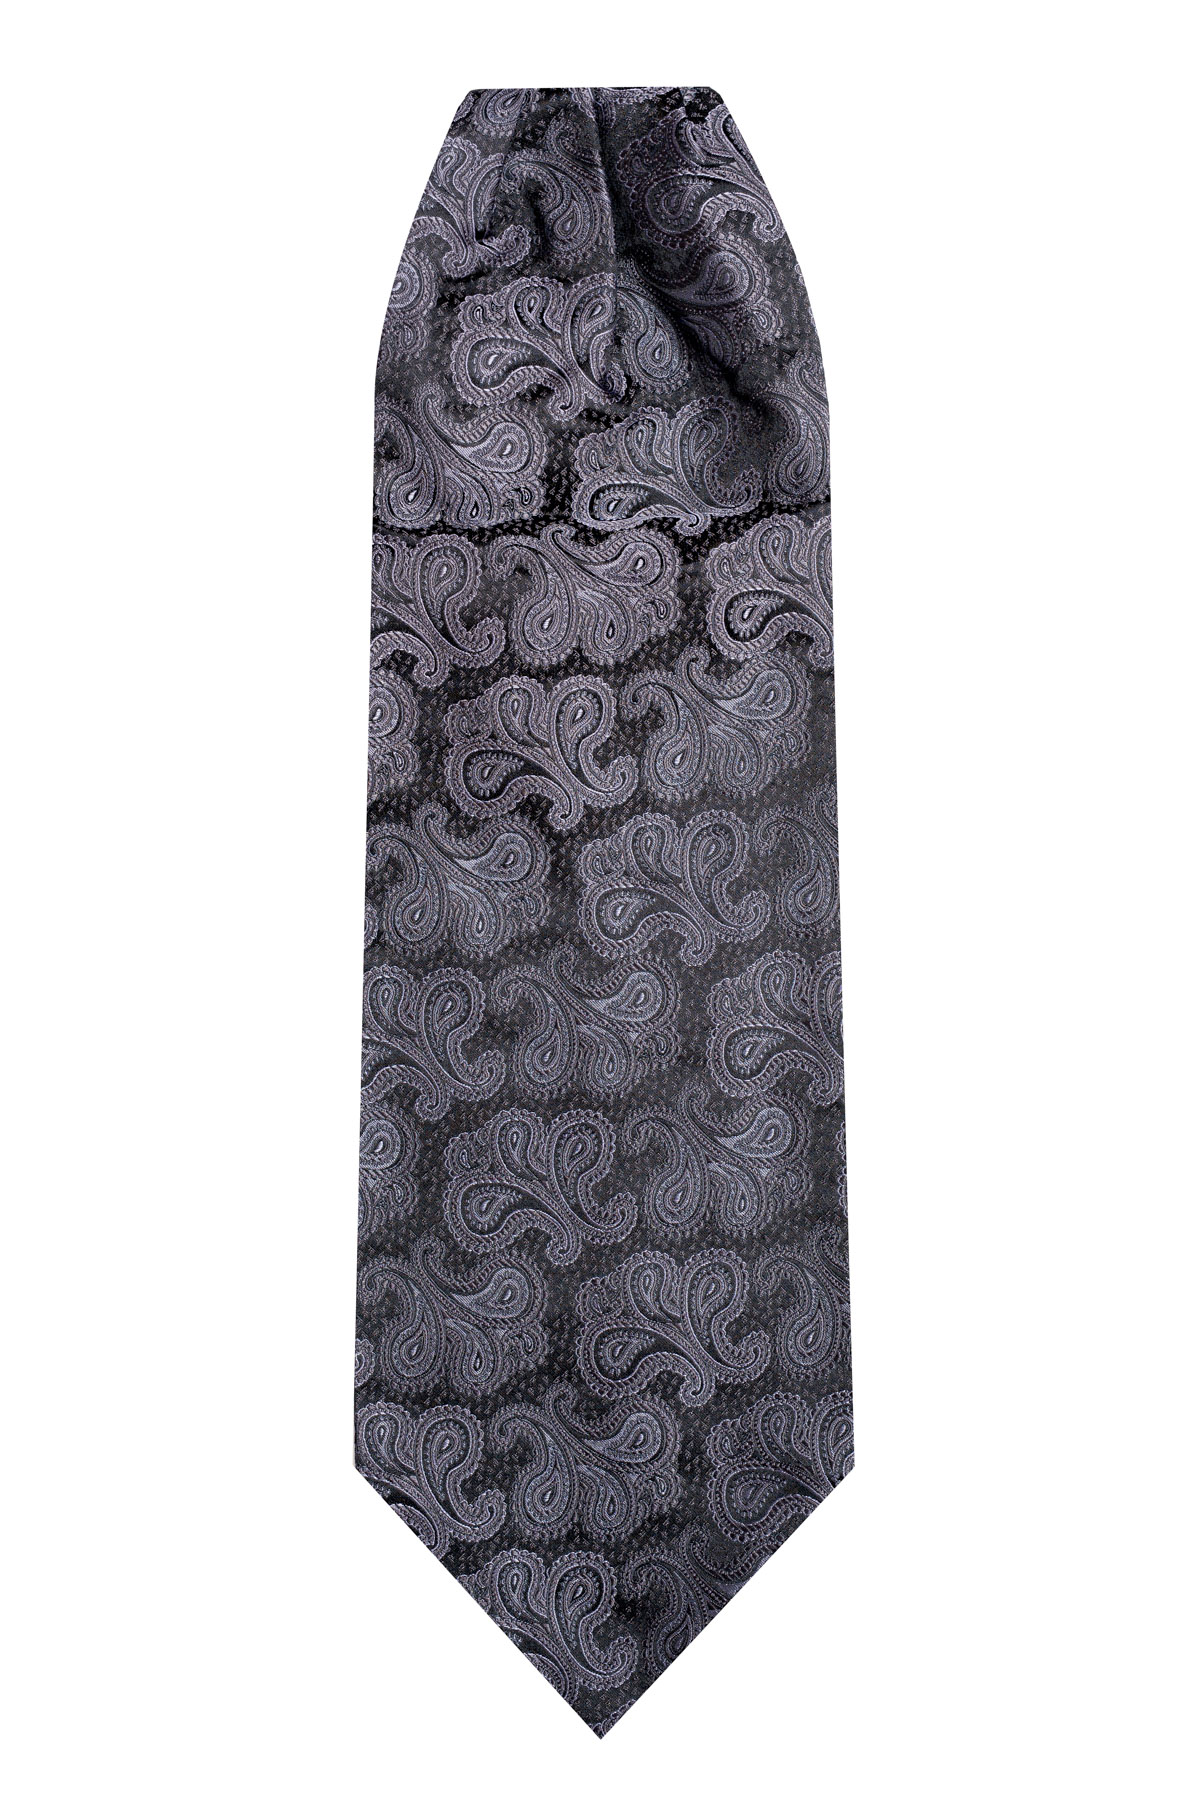 Cravate Ascot